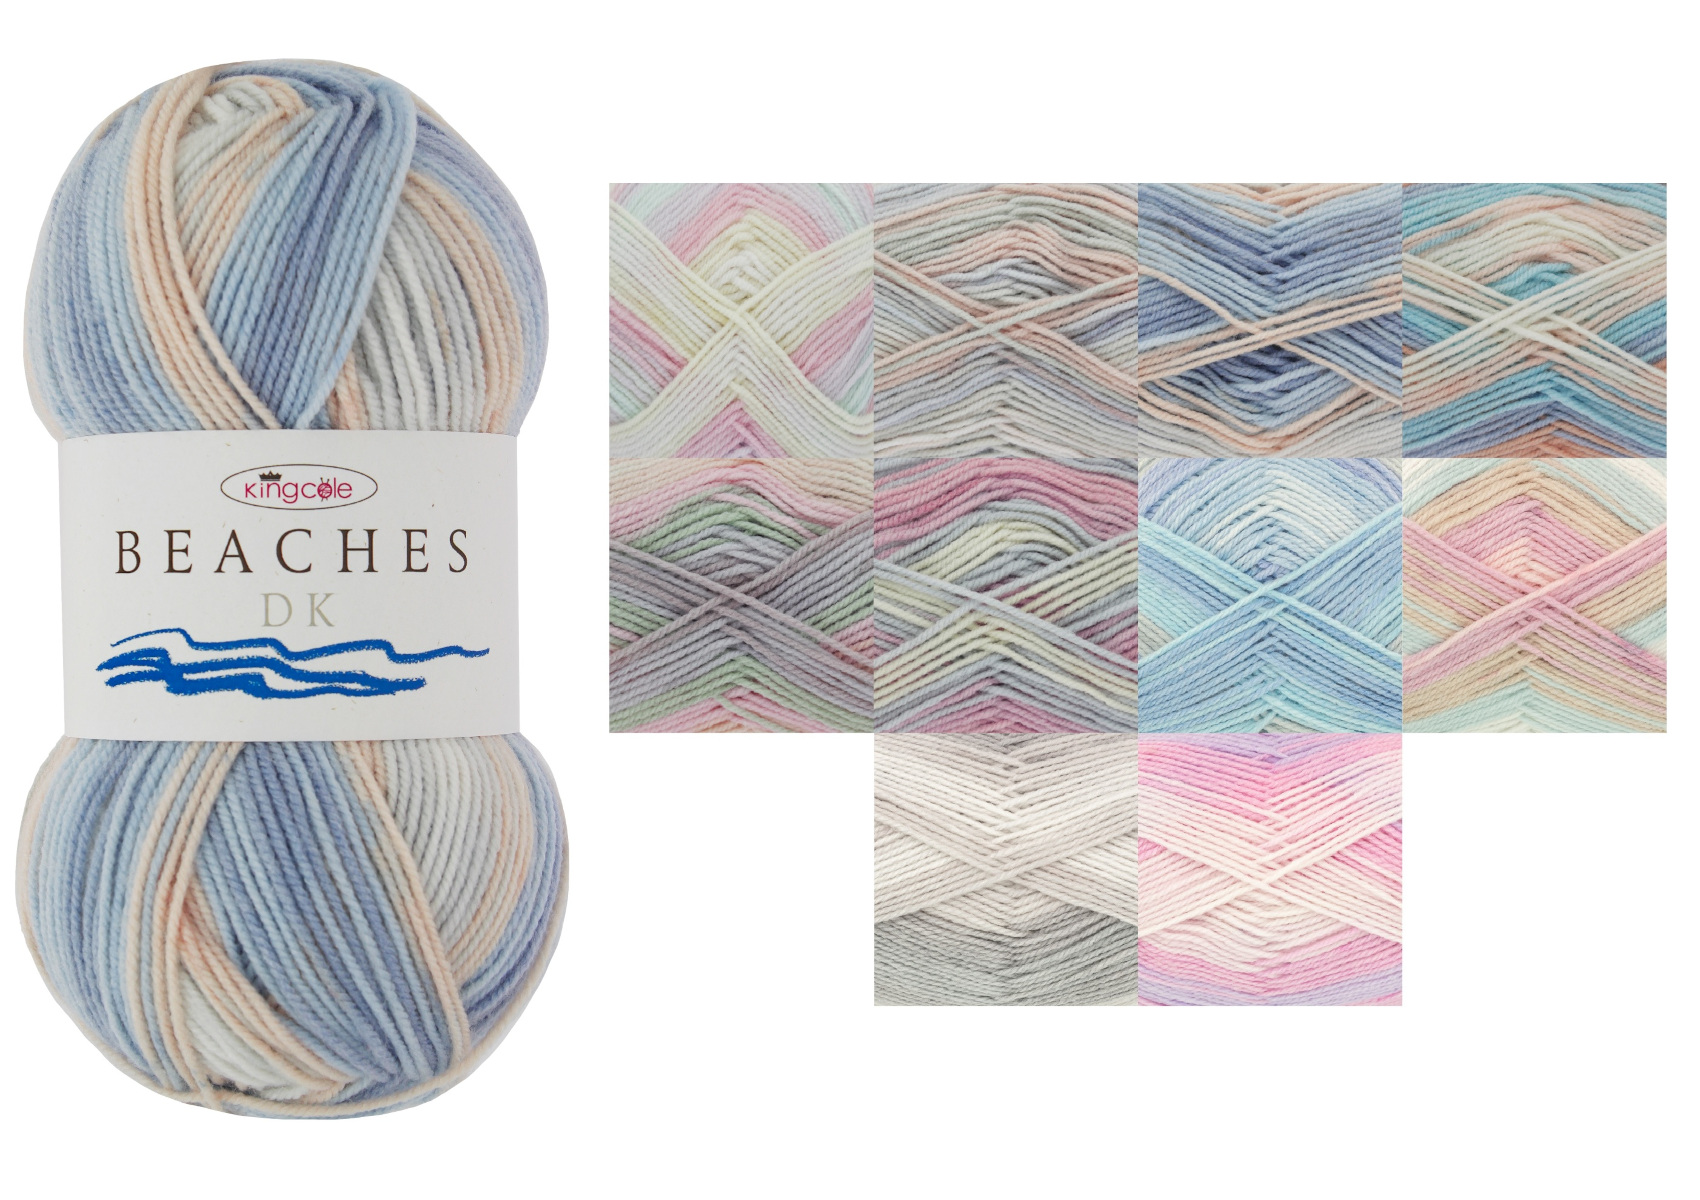 100g Ball Comfort Prints DK Double Knitting Wool King Cole Acrylic /& Nylon Yarn